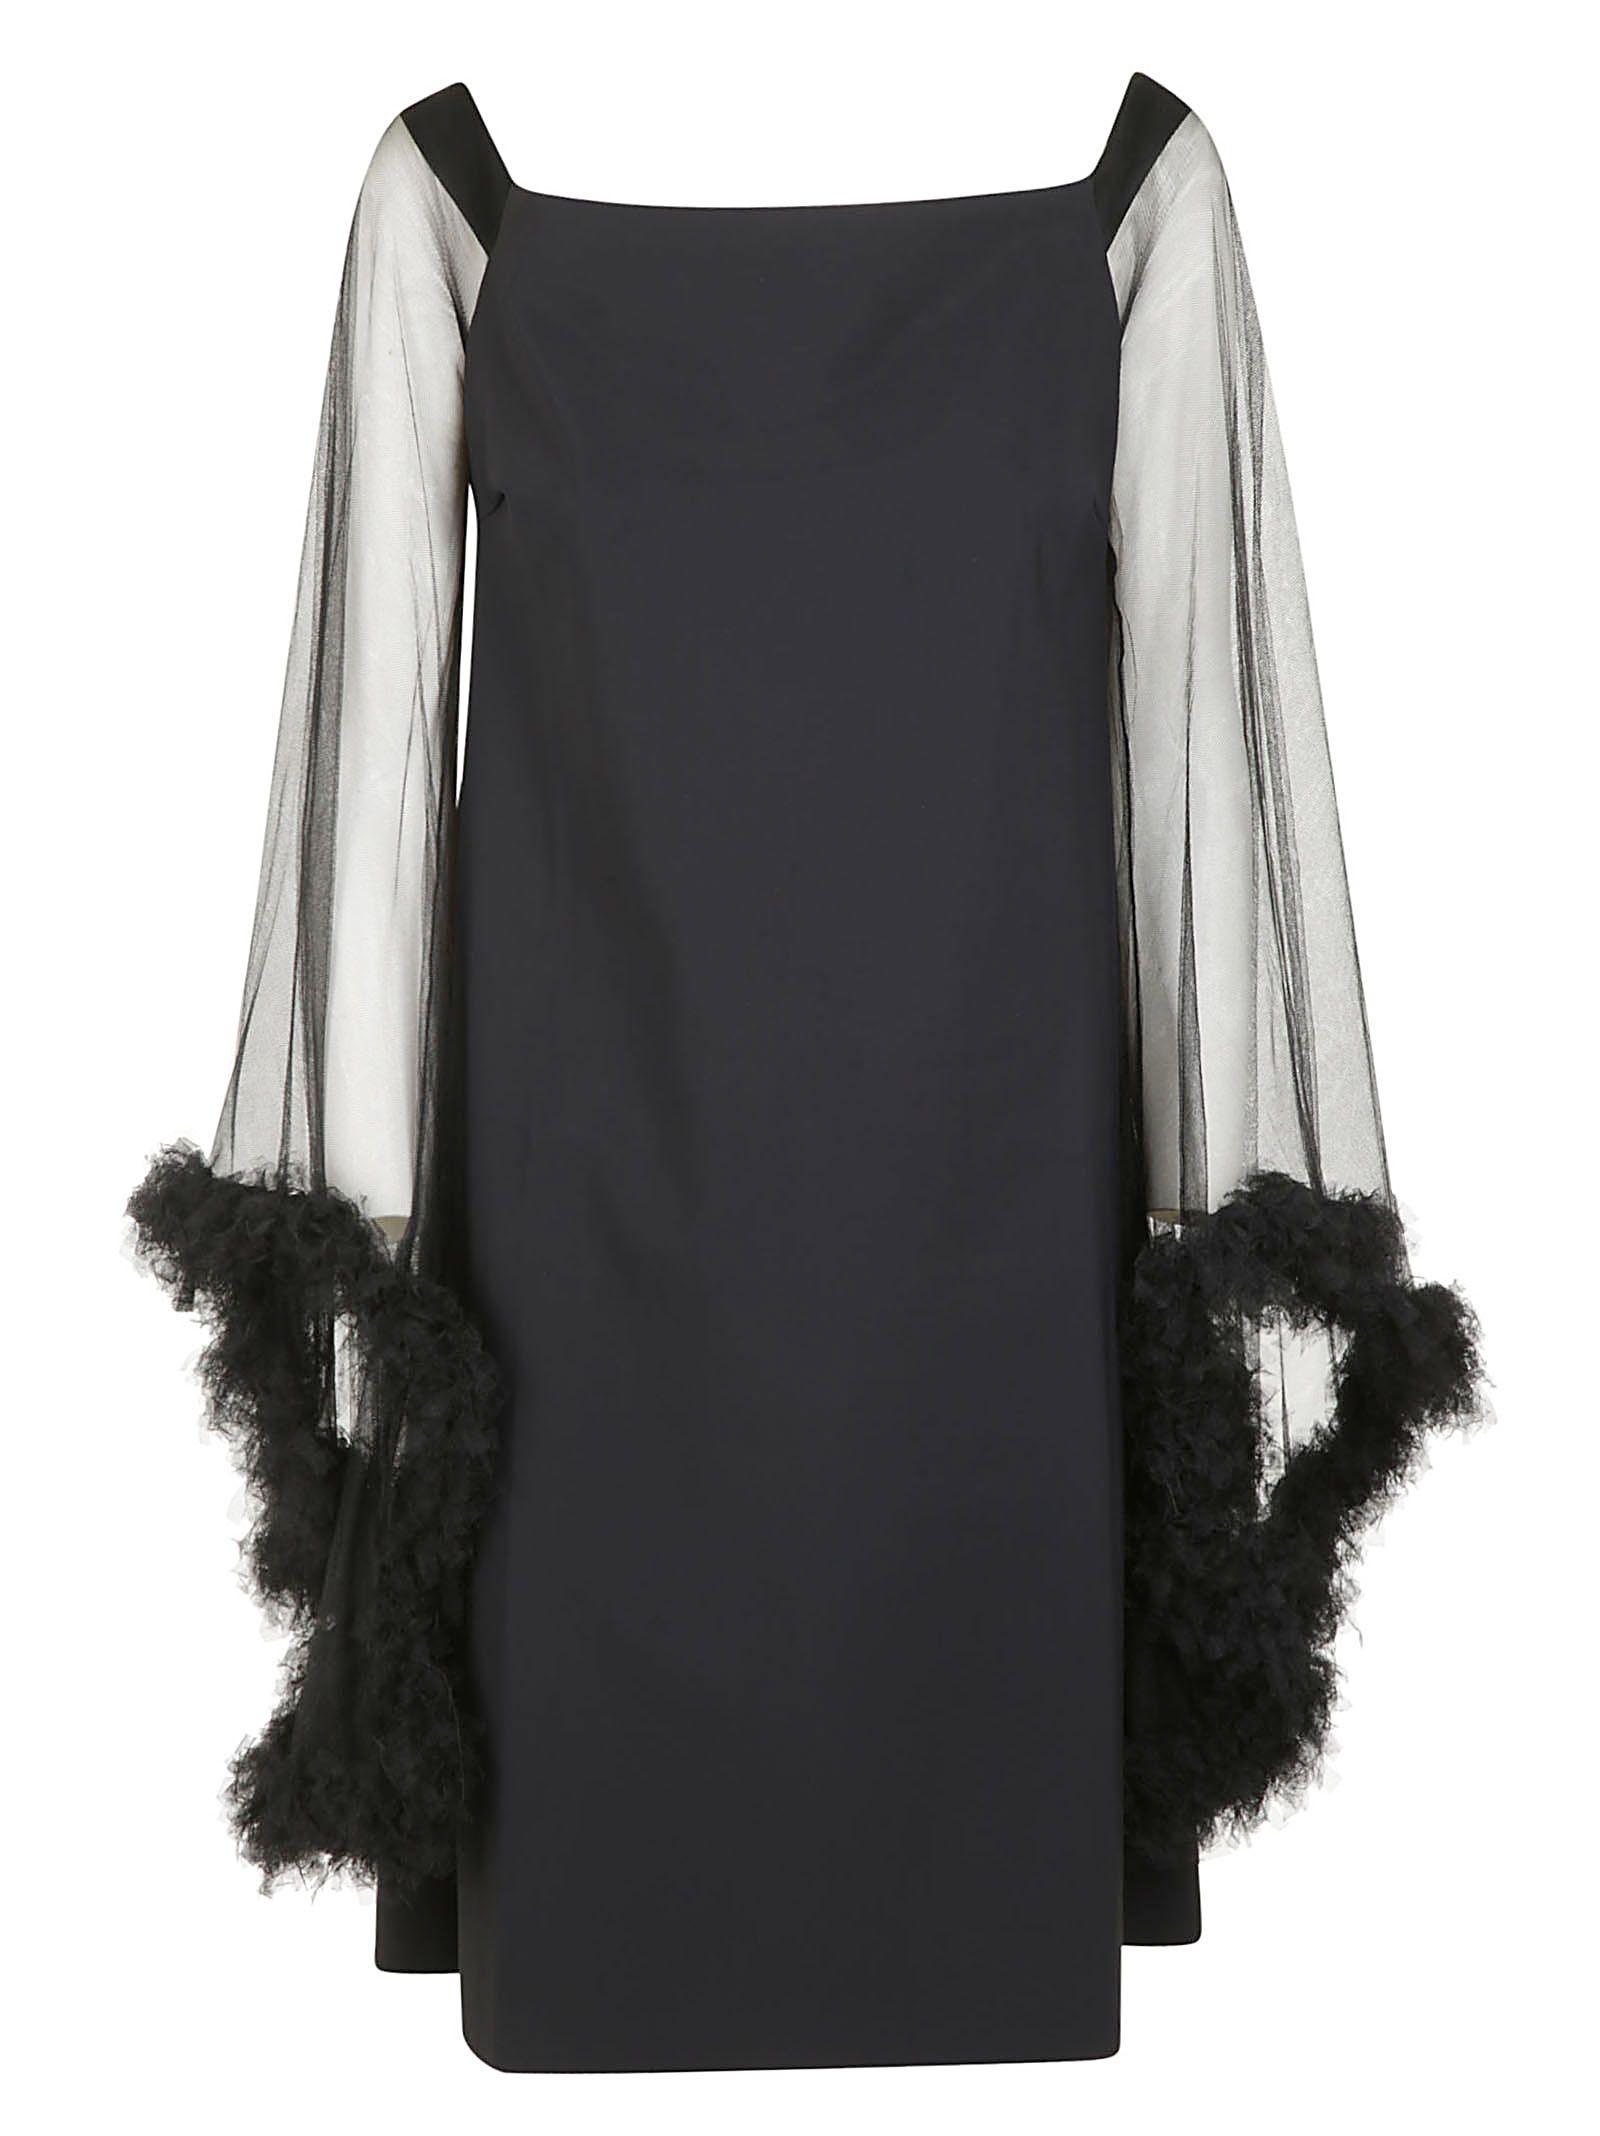 LA PETIT ROBE DI CHIARA BONI Chiyo Mini Dress in Black